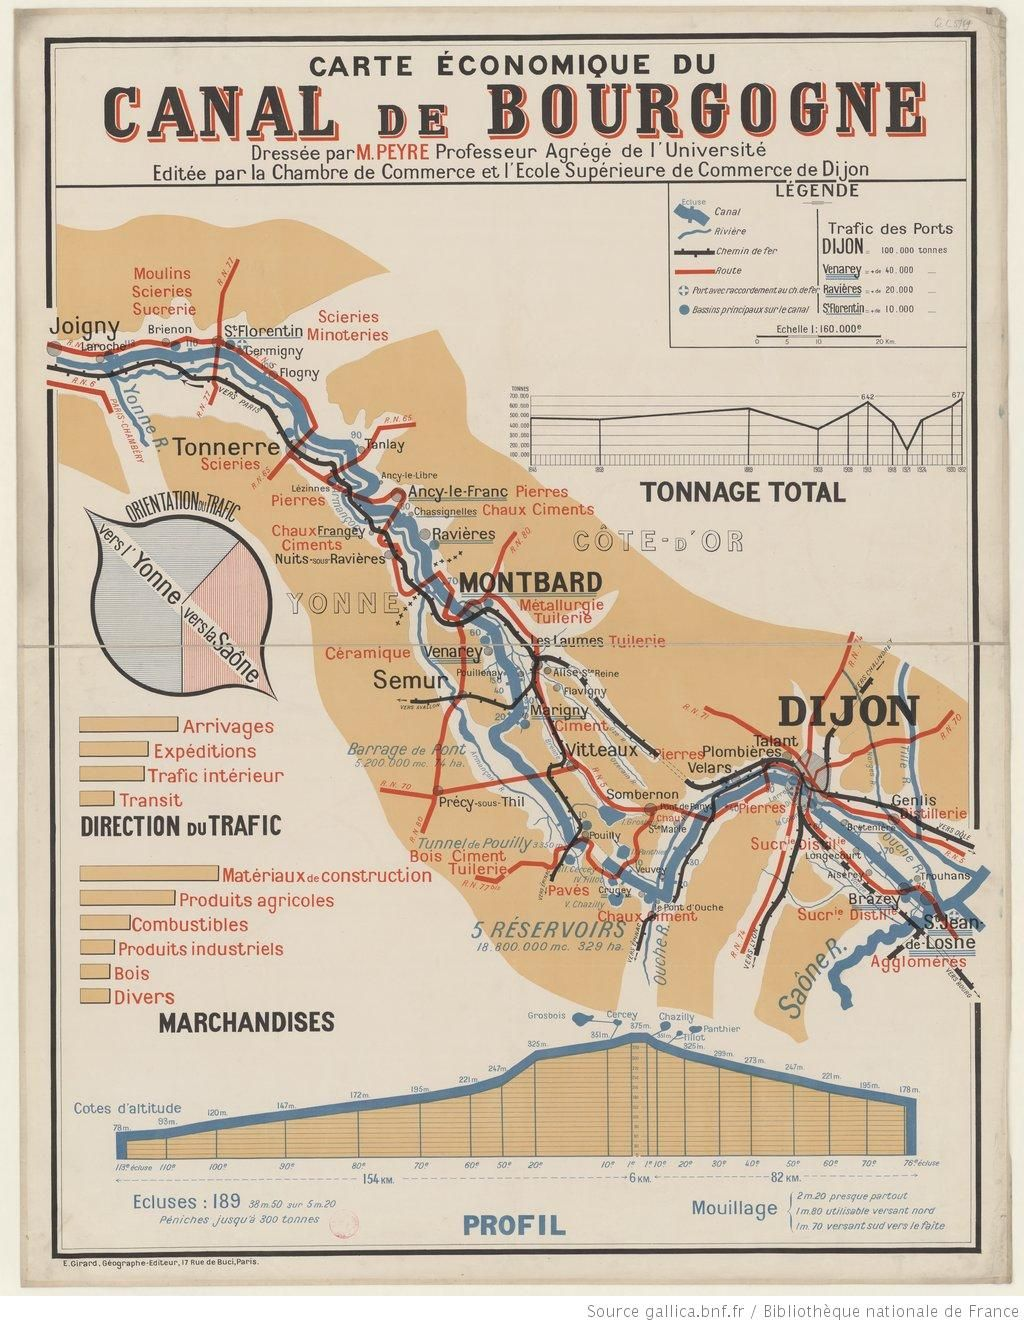 Canal De Bourgogne Carte.Carte Economique Du Canal De Bourgogne Dressee Par M Peyre